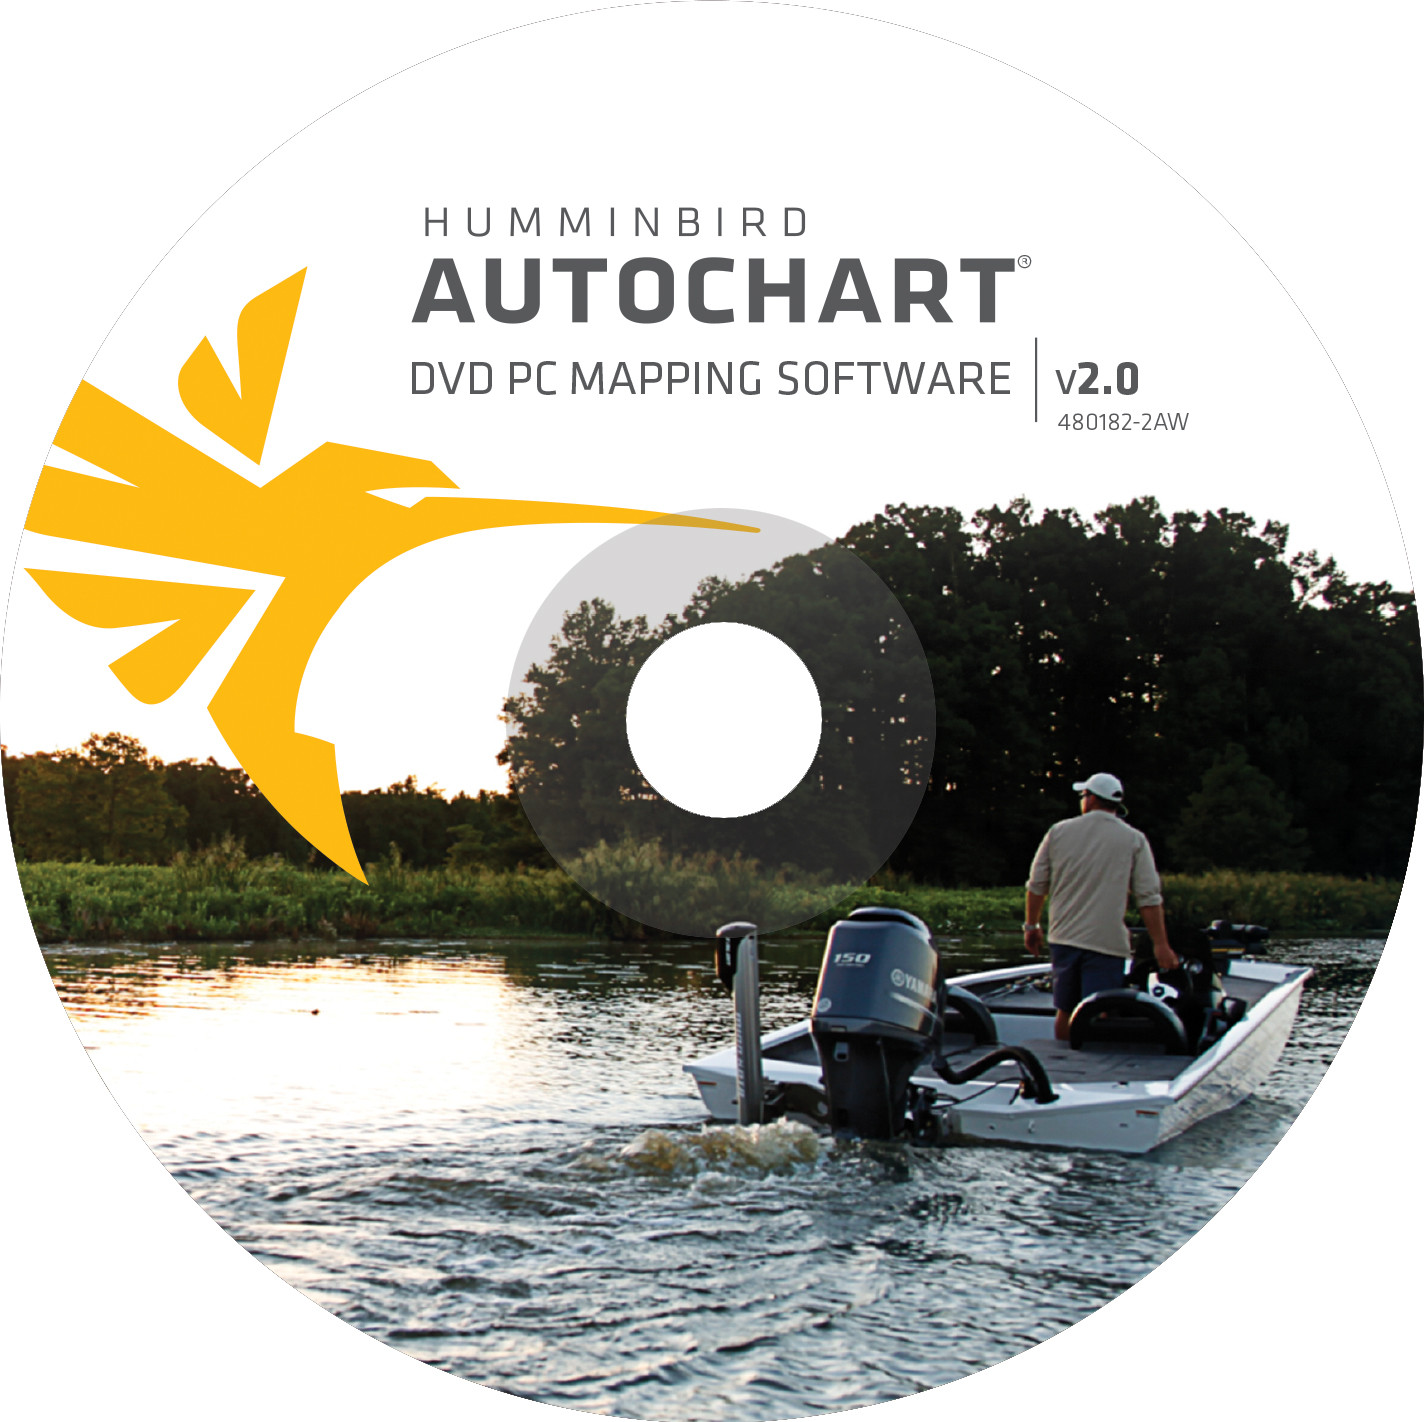 Carte Europe Humminbird Zero Line Pour Logiciel Autochart.Logiciel Autochart Et Carte Zero Lines Europe